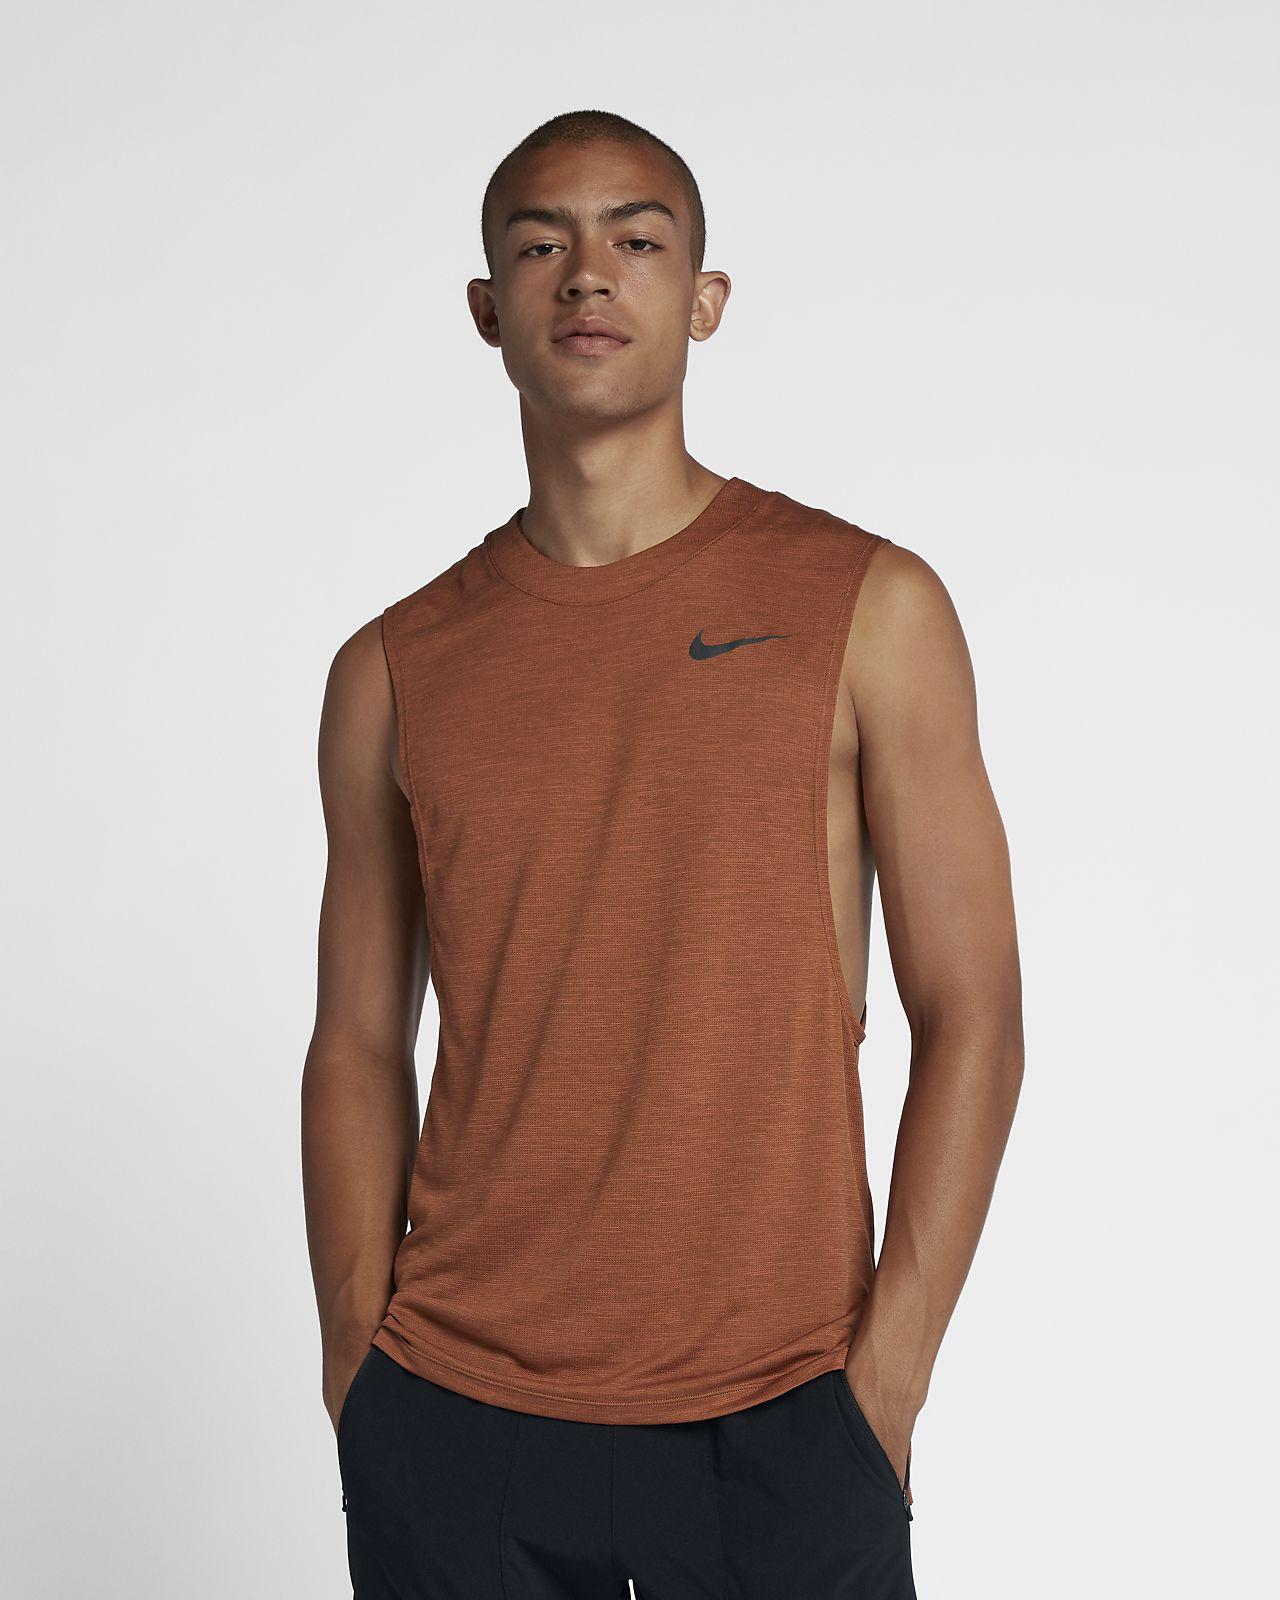 Pánský běžecký top bez rukávů Nike Medalist Run Division